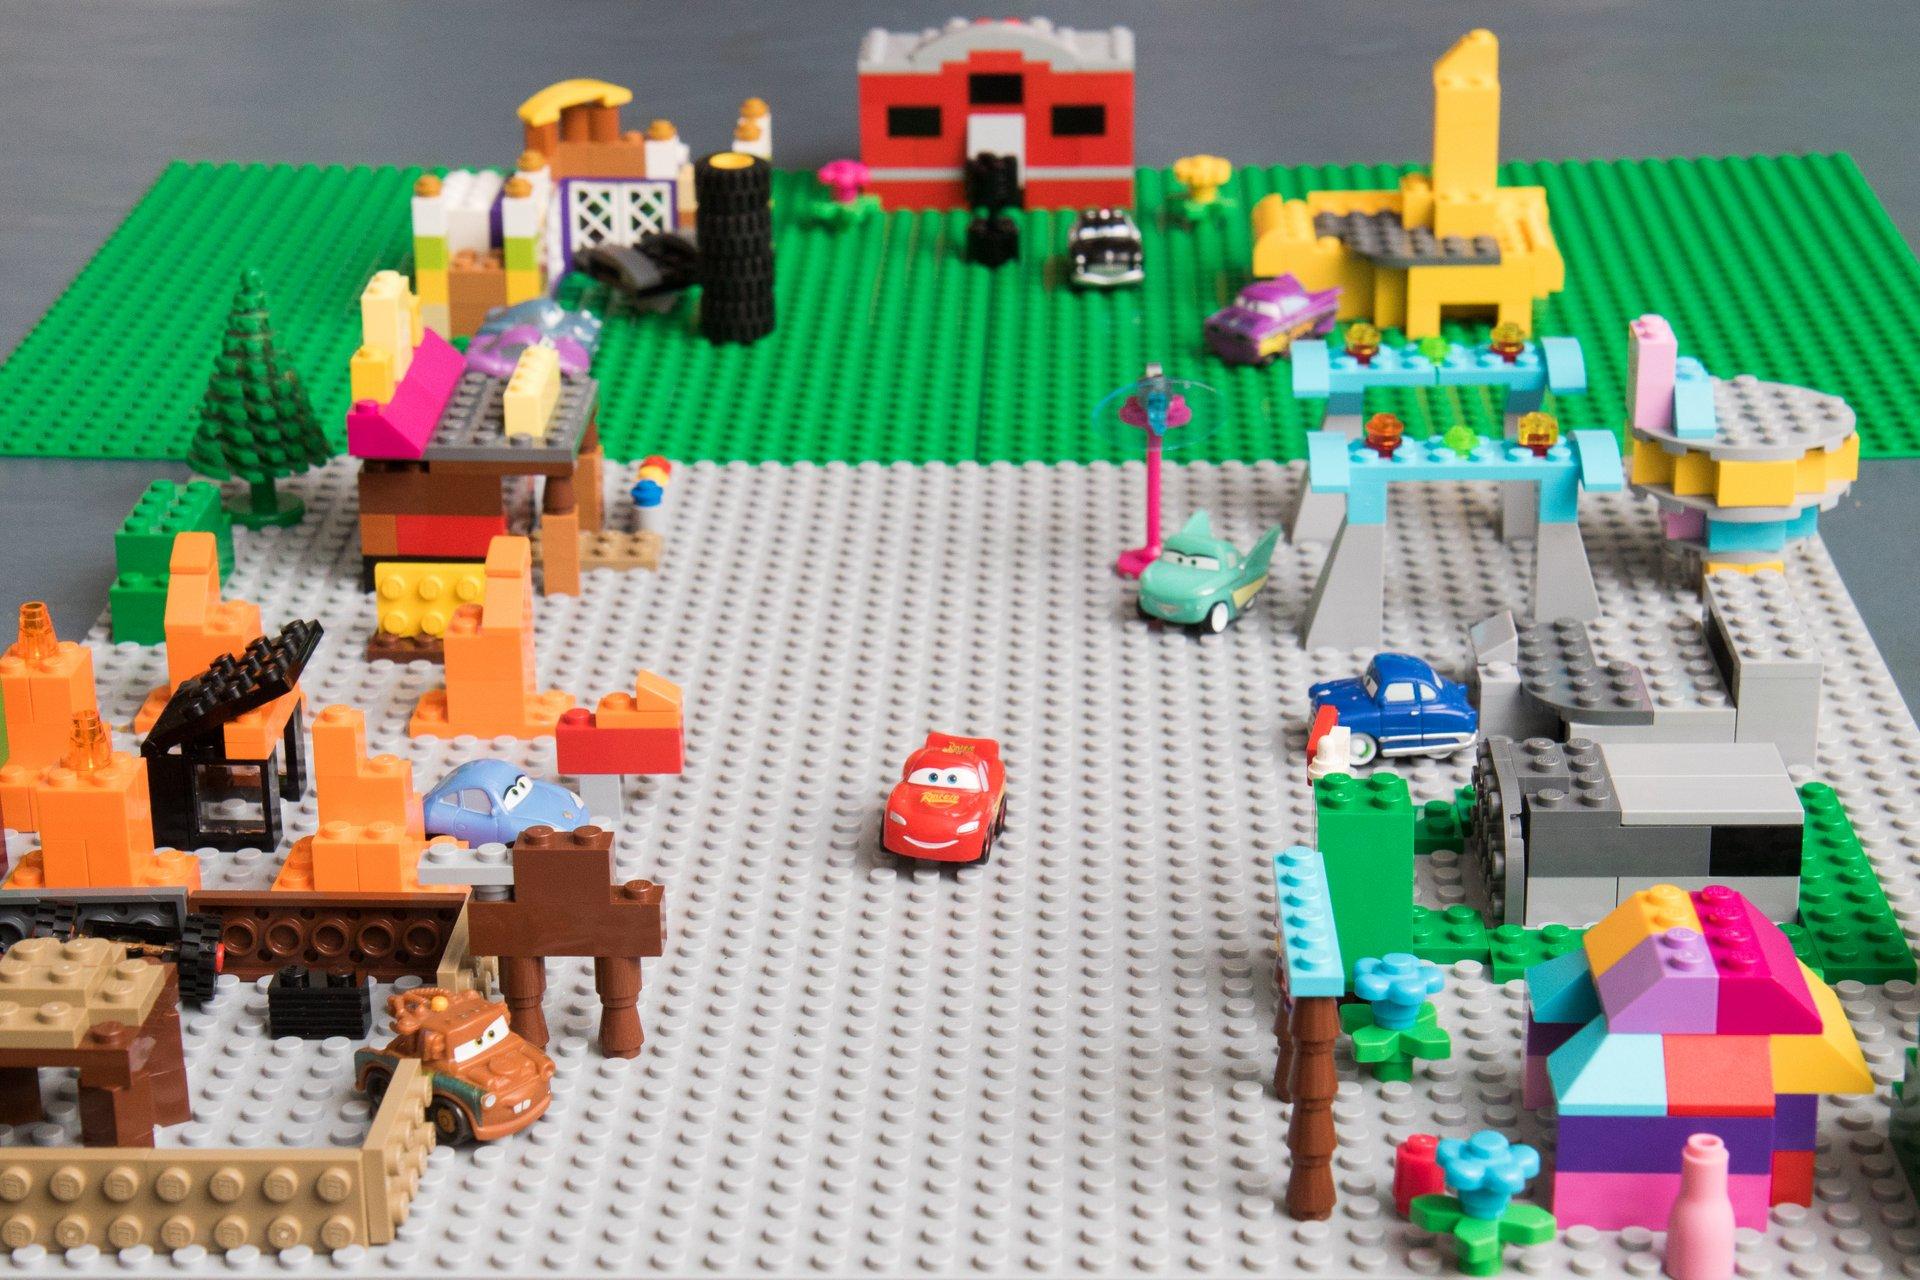 001 LEGO Radiator Springs